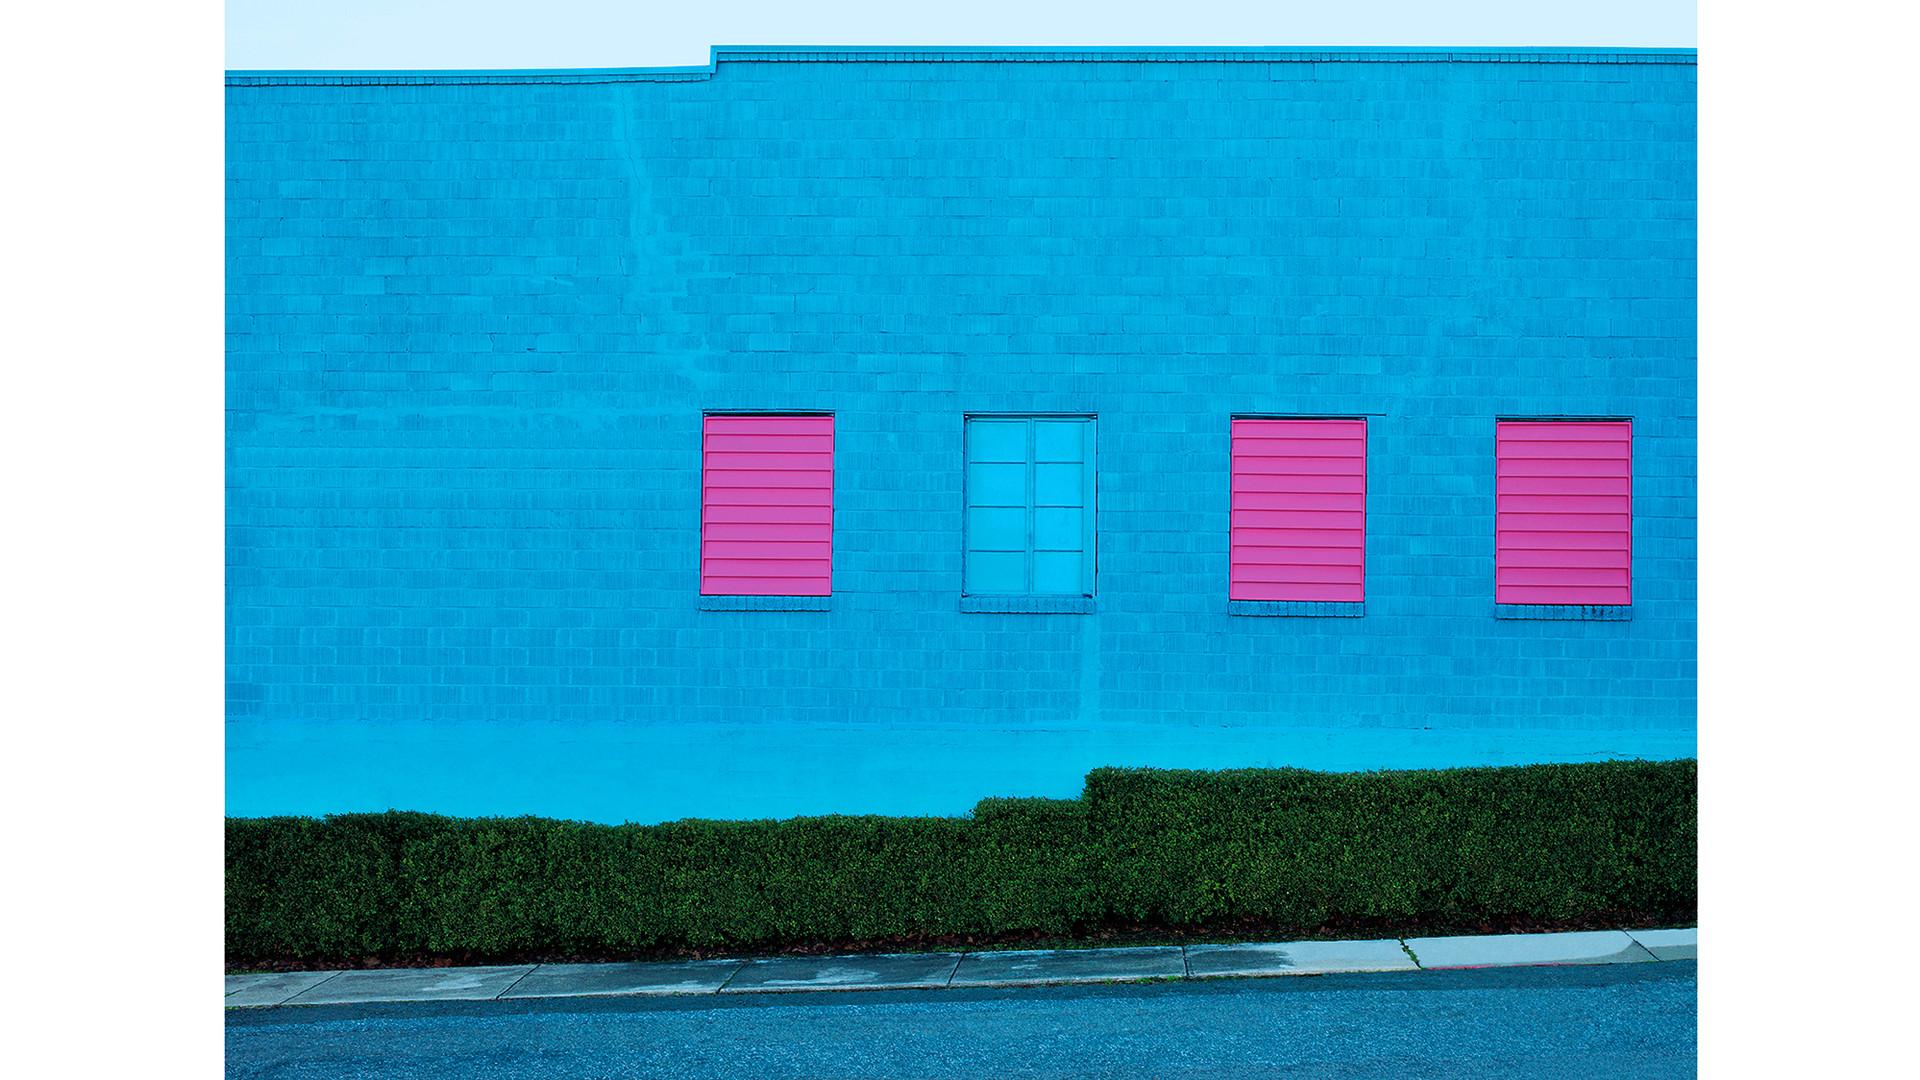 Gleason Drive, 2017 125 x 163 cm, archival pigment print, ed. of 7